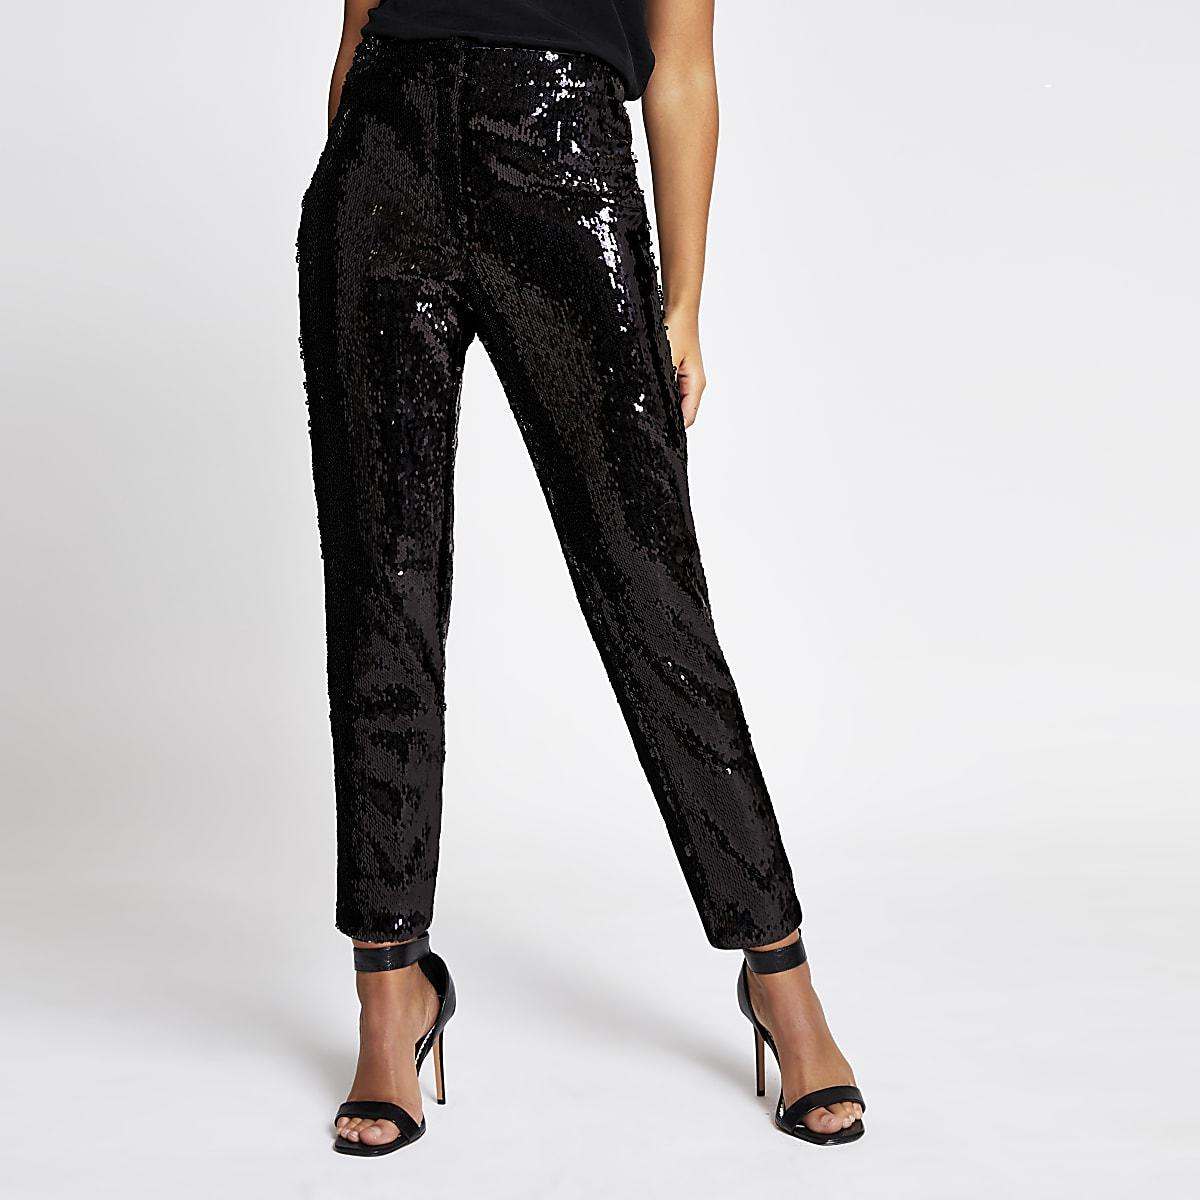 Black sequin high rise cigarette trousers